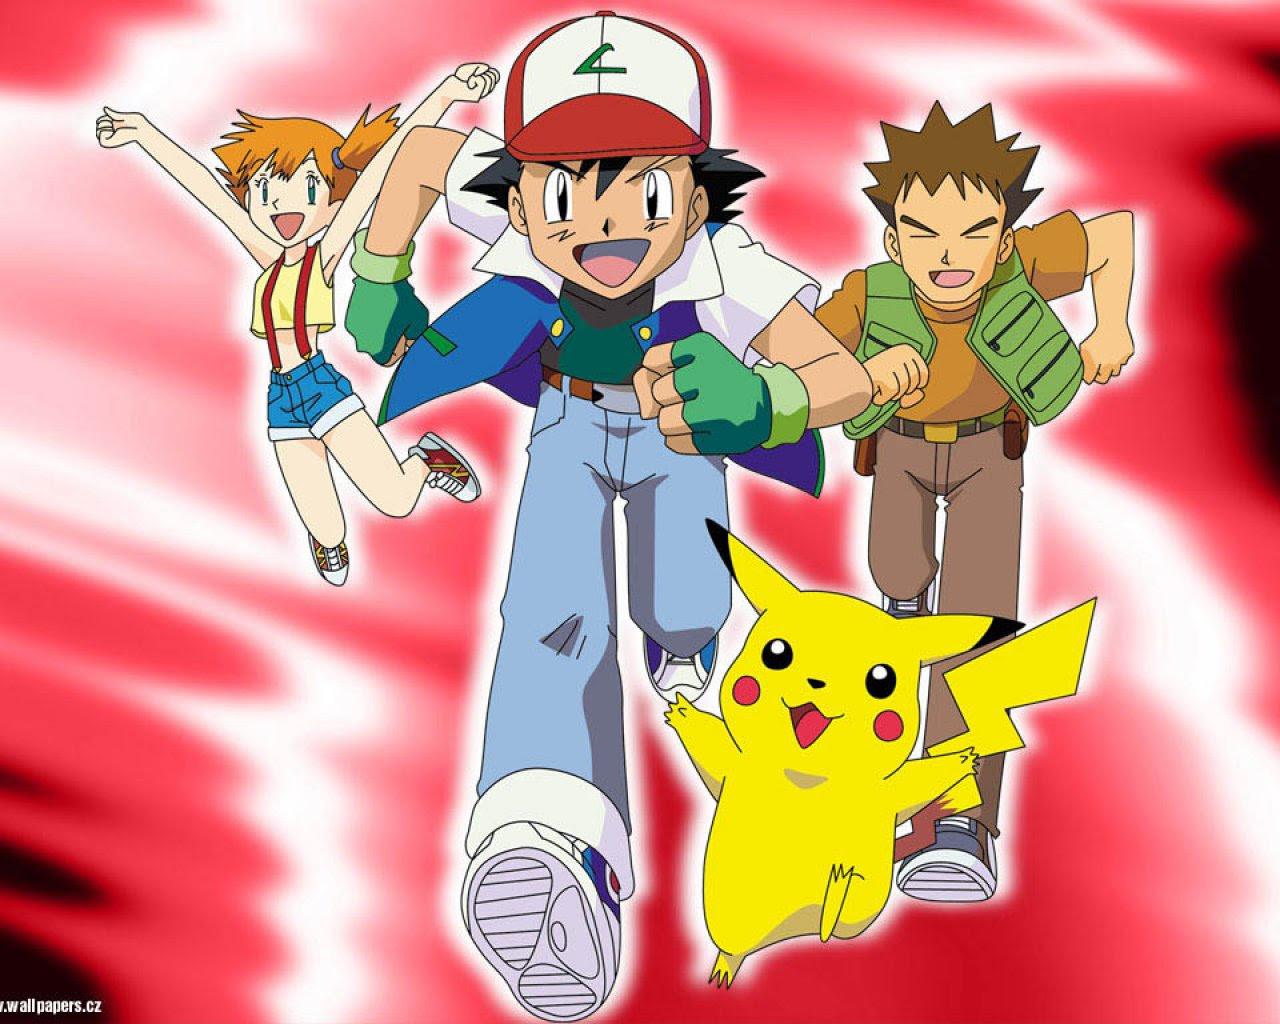 http://blog.espol.edu.ec/juank007max/files/2010/11/2479-pokemon-002-exjll.jpg